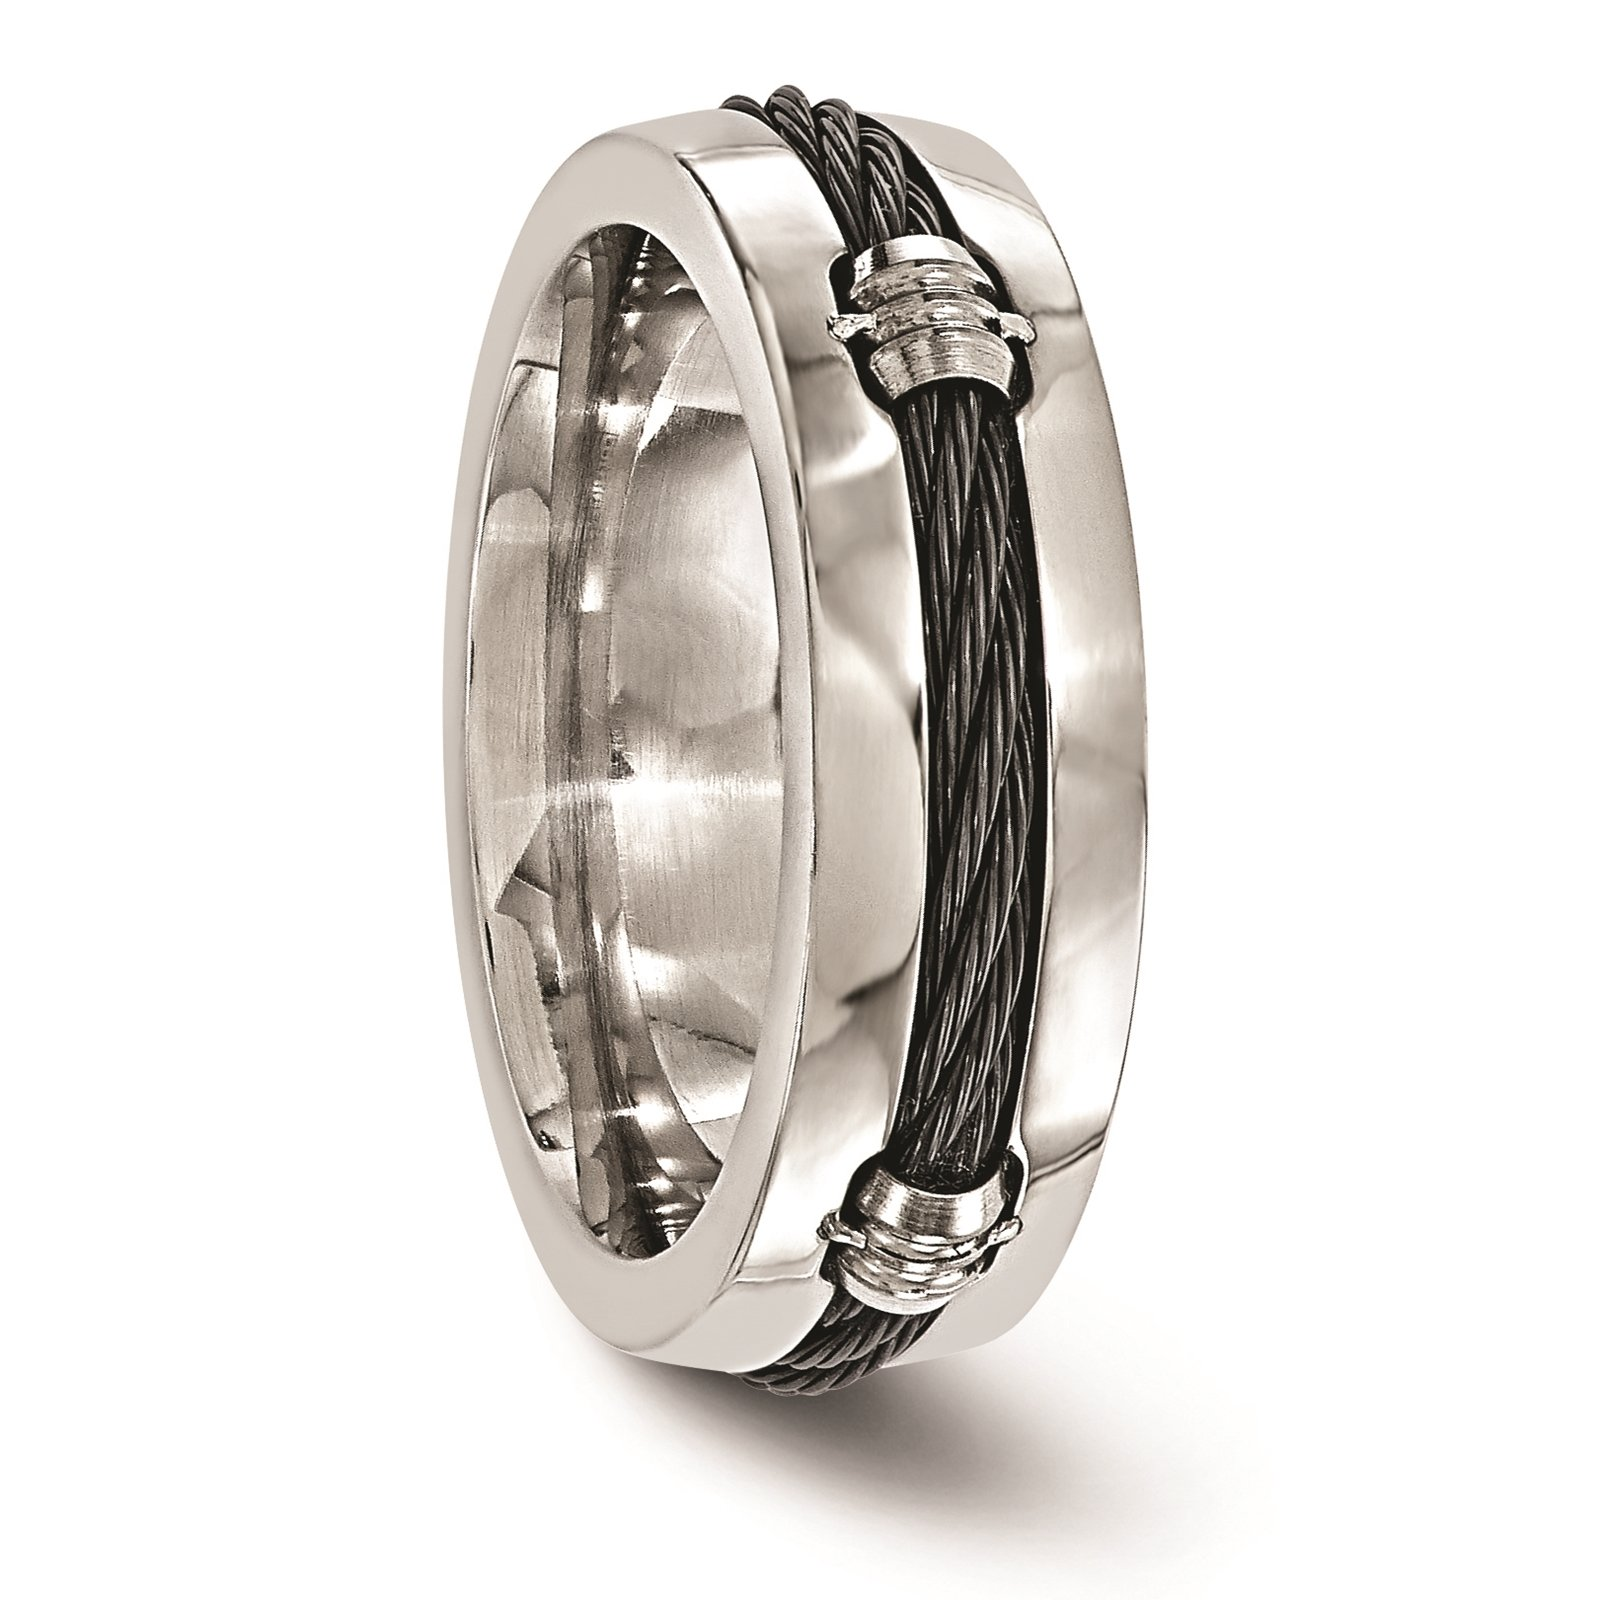 Titanium & Cable Polished 7mm Wedding Ring Band Size 8 by Edward Mirell by Venture Edward Mirell Titanium Bands (Image #4)